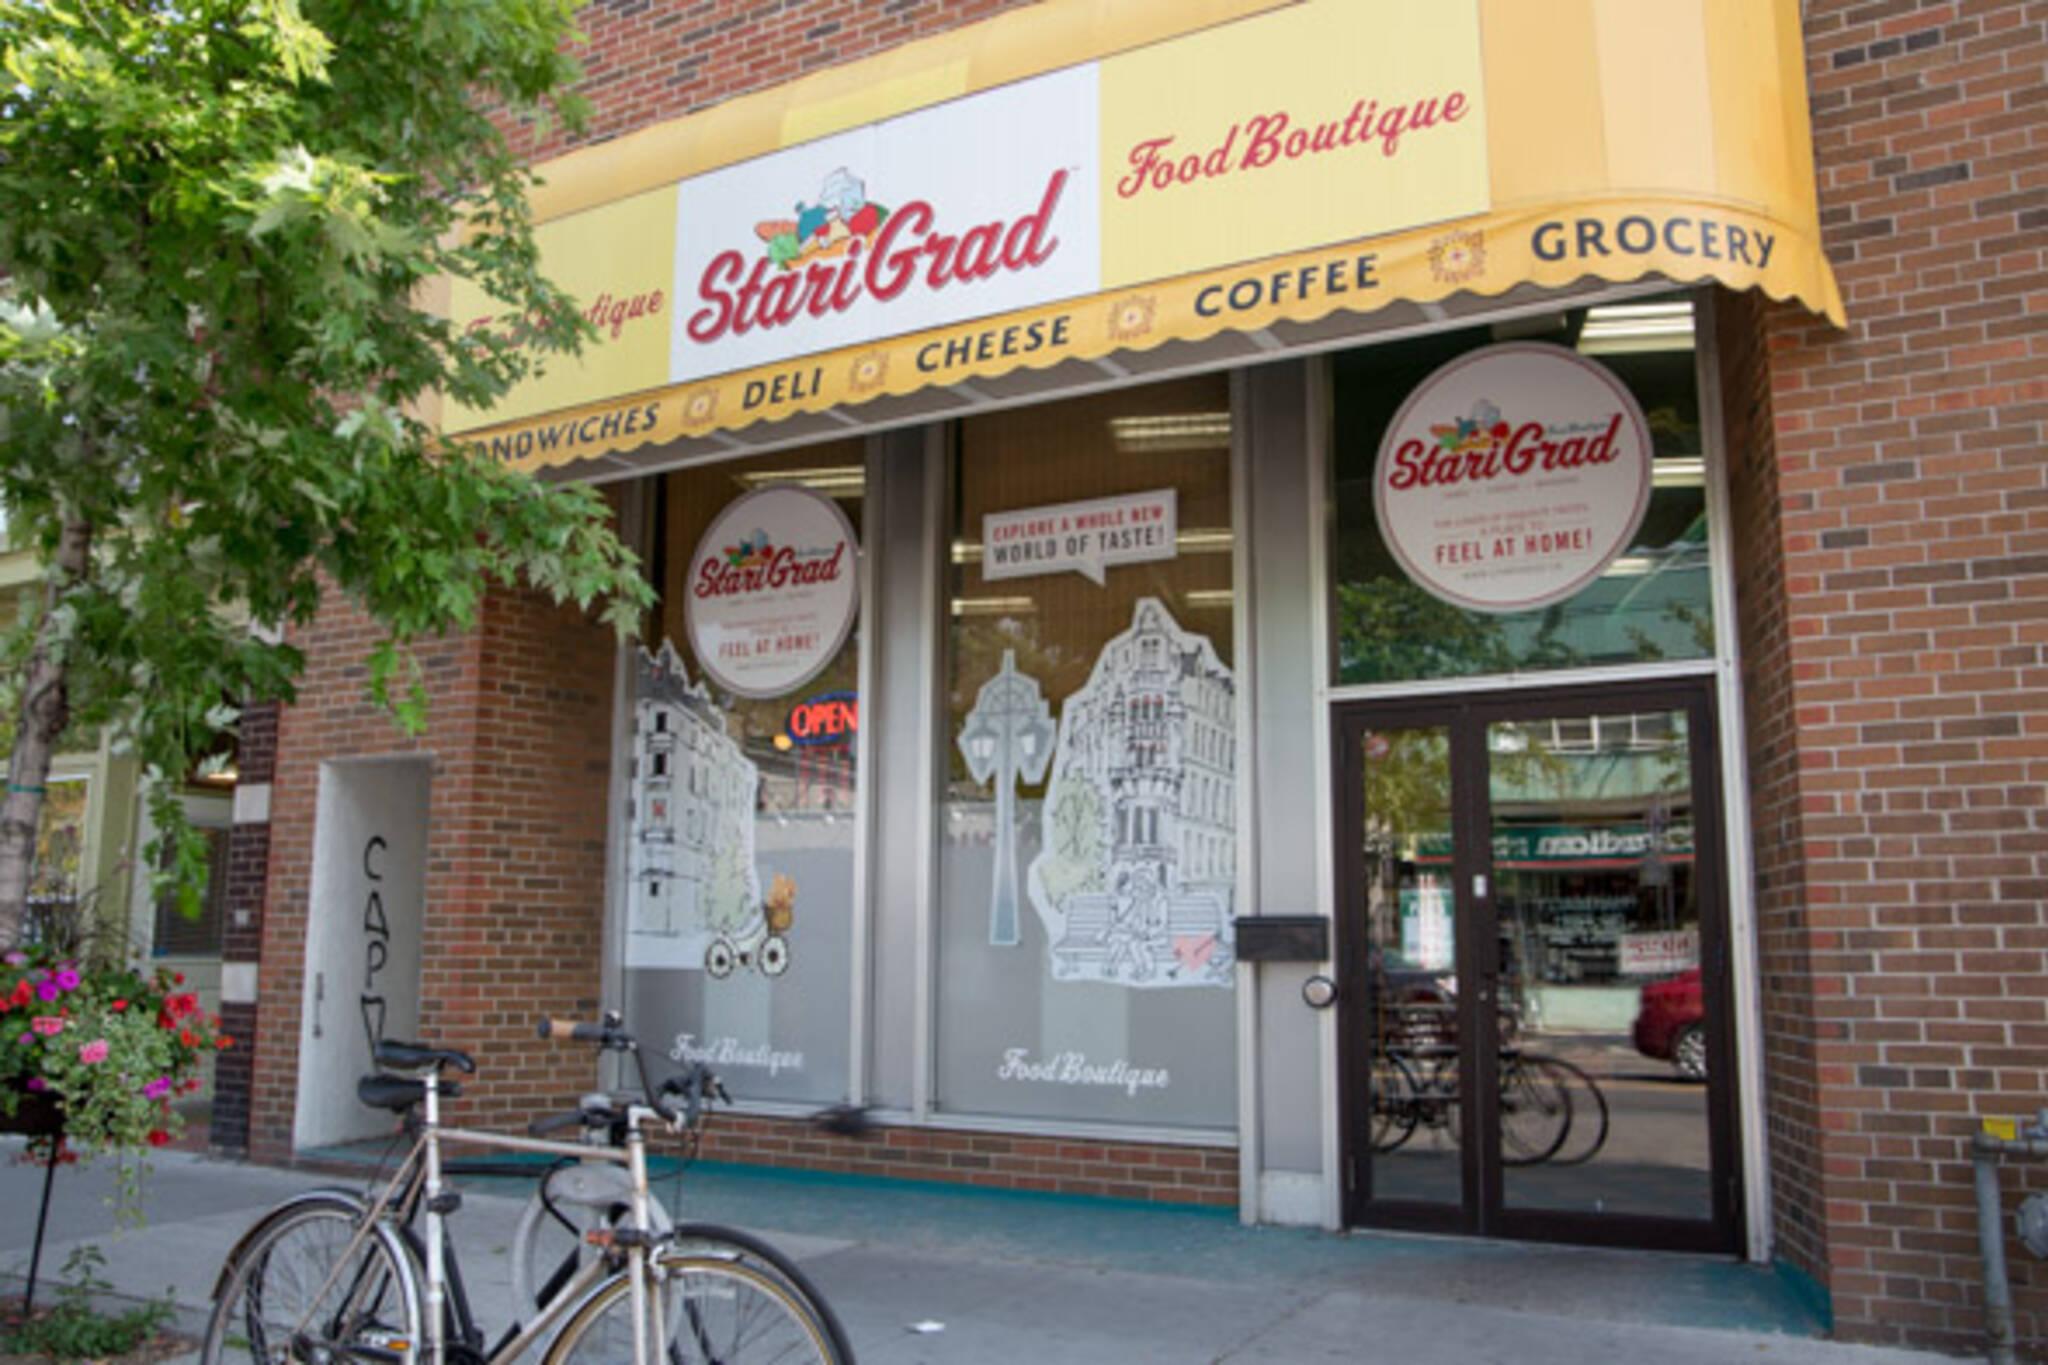 Stari Grad Food Boutique Toronto